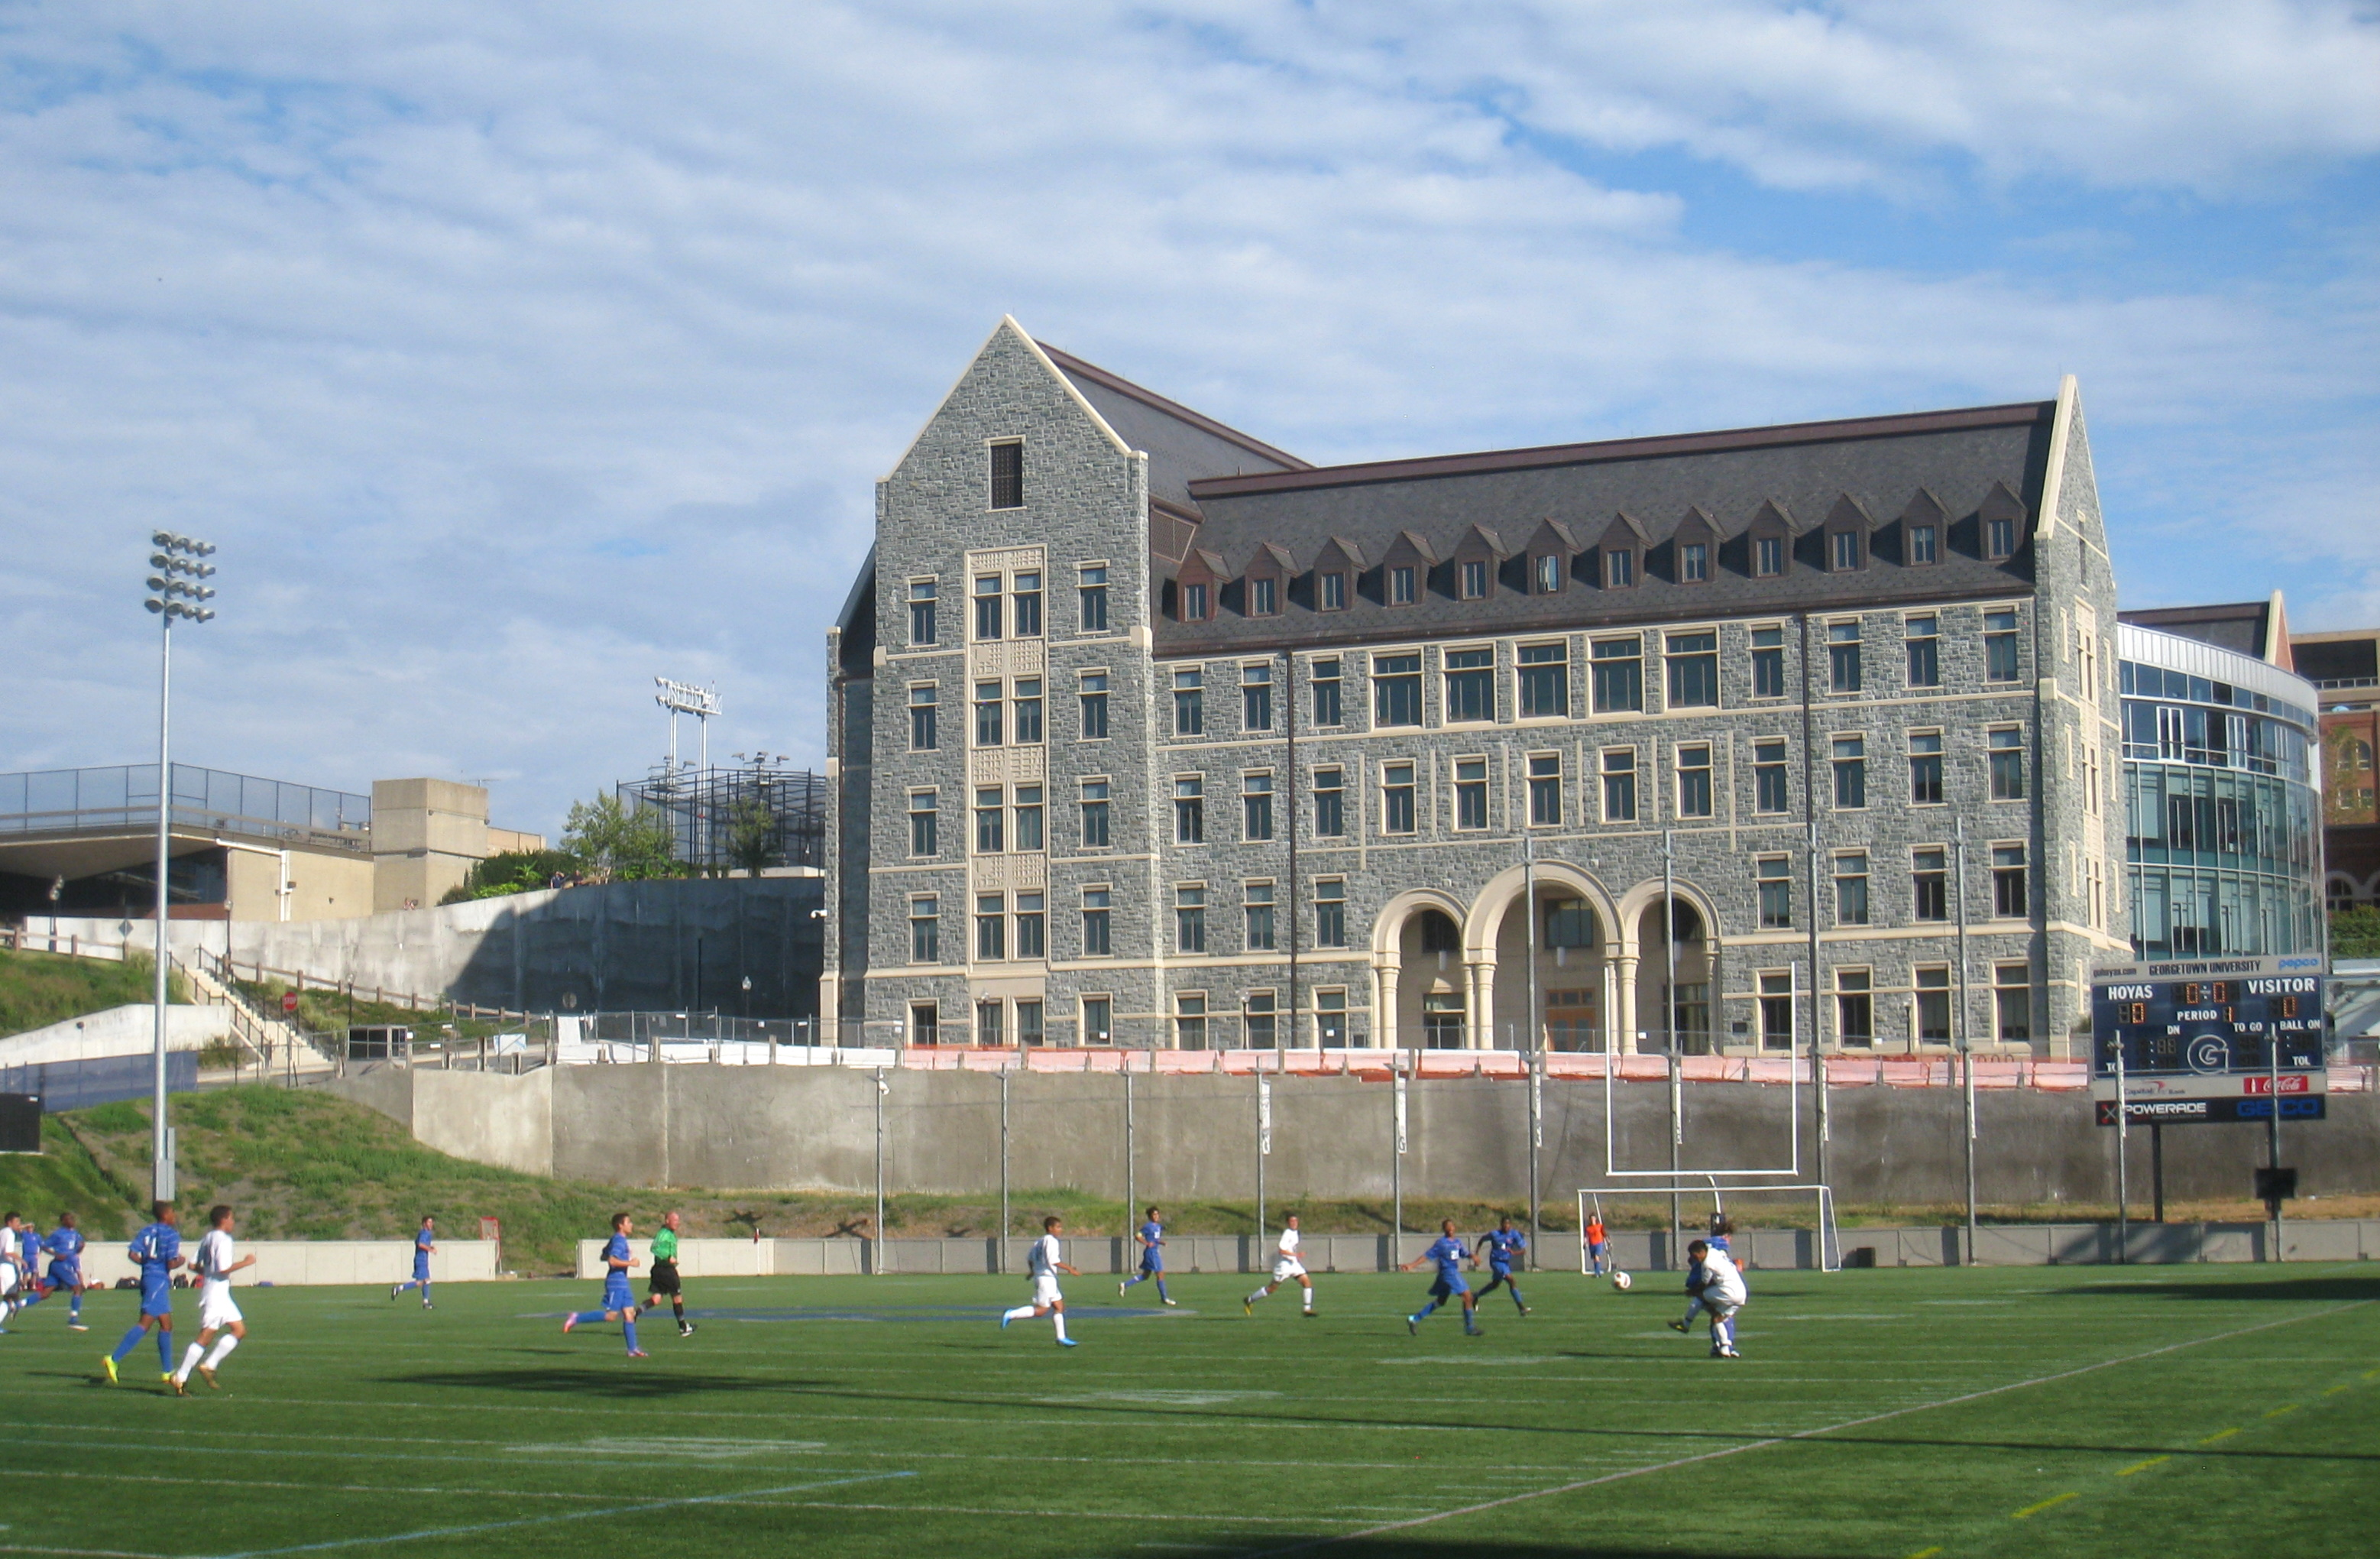 Georgetown University Self Guided Walking Tour